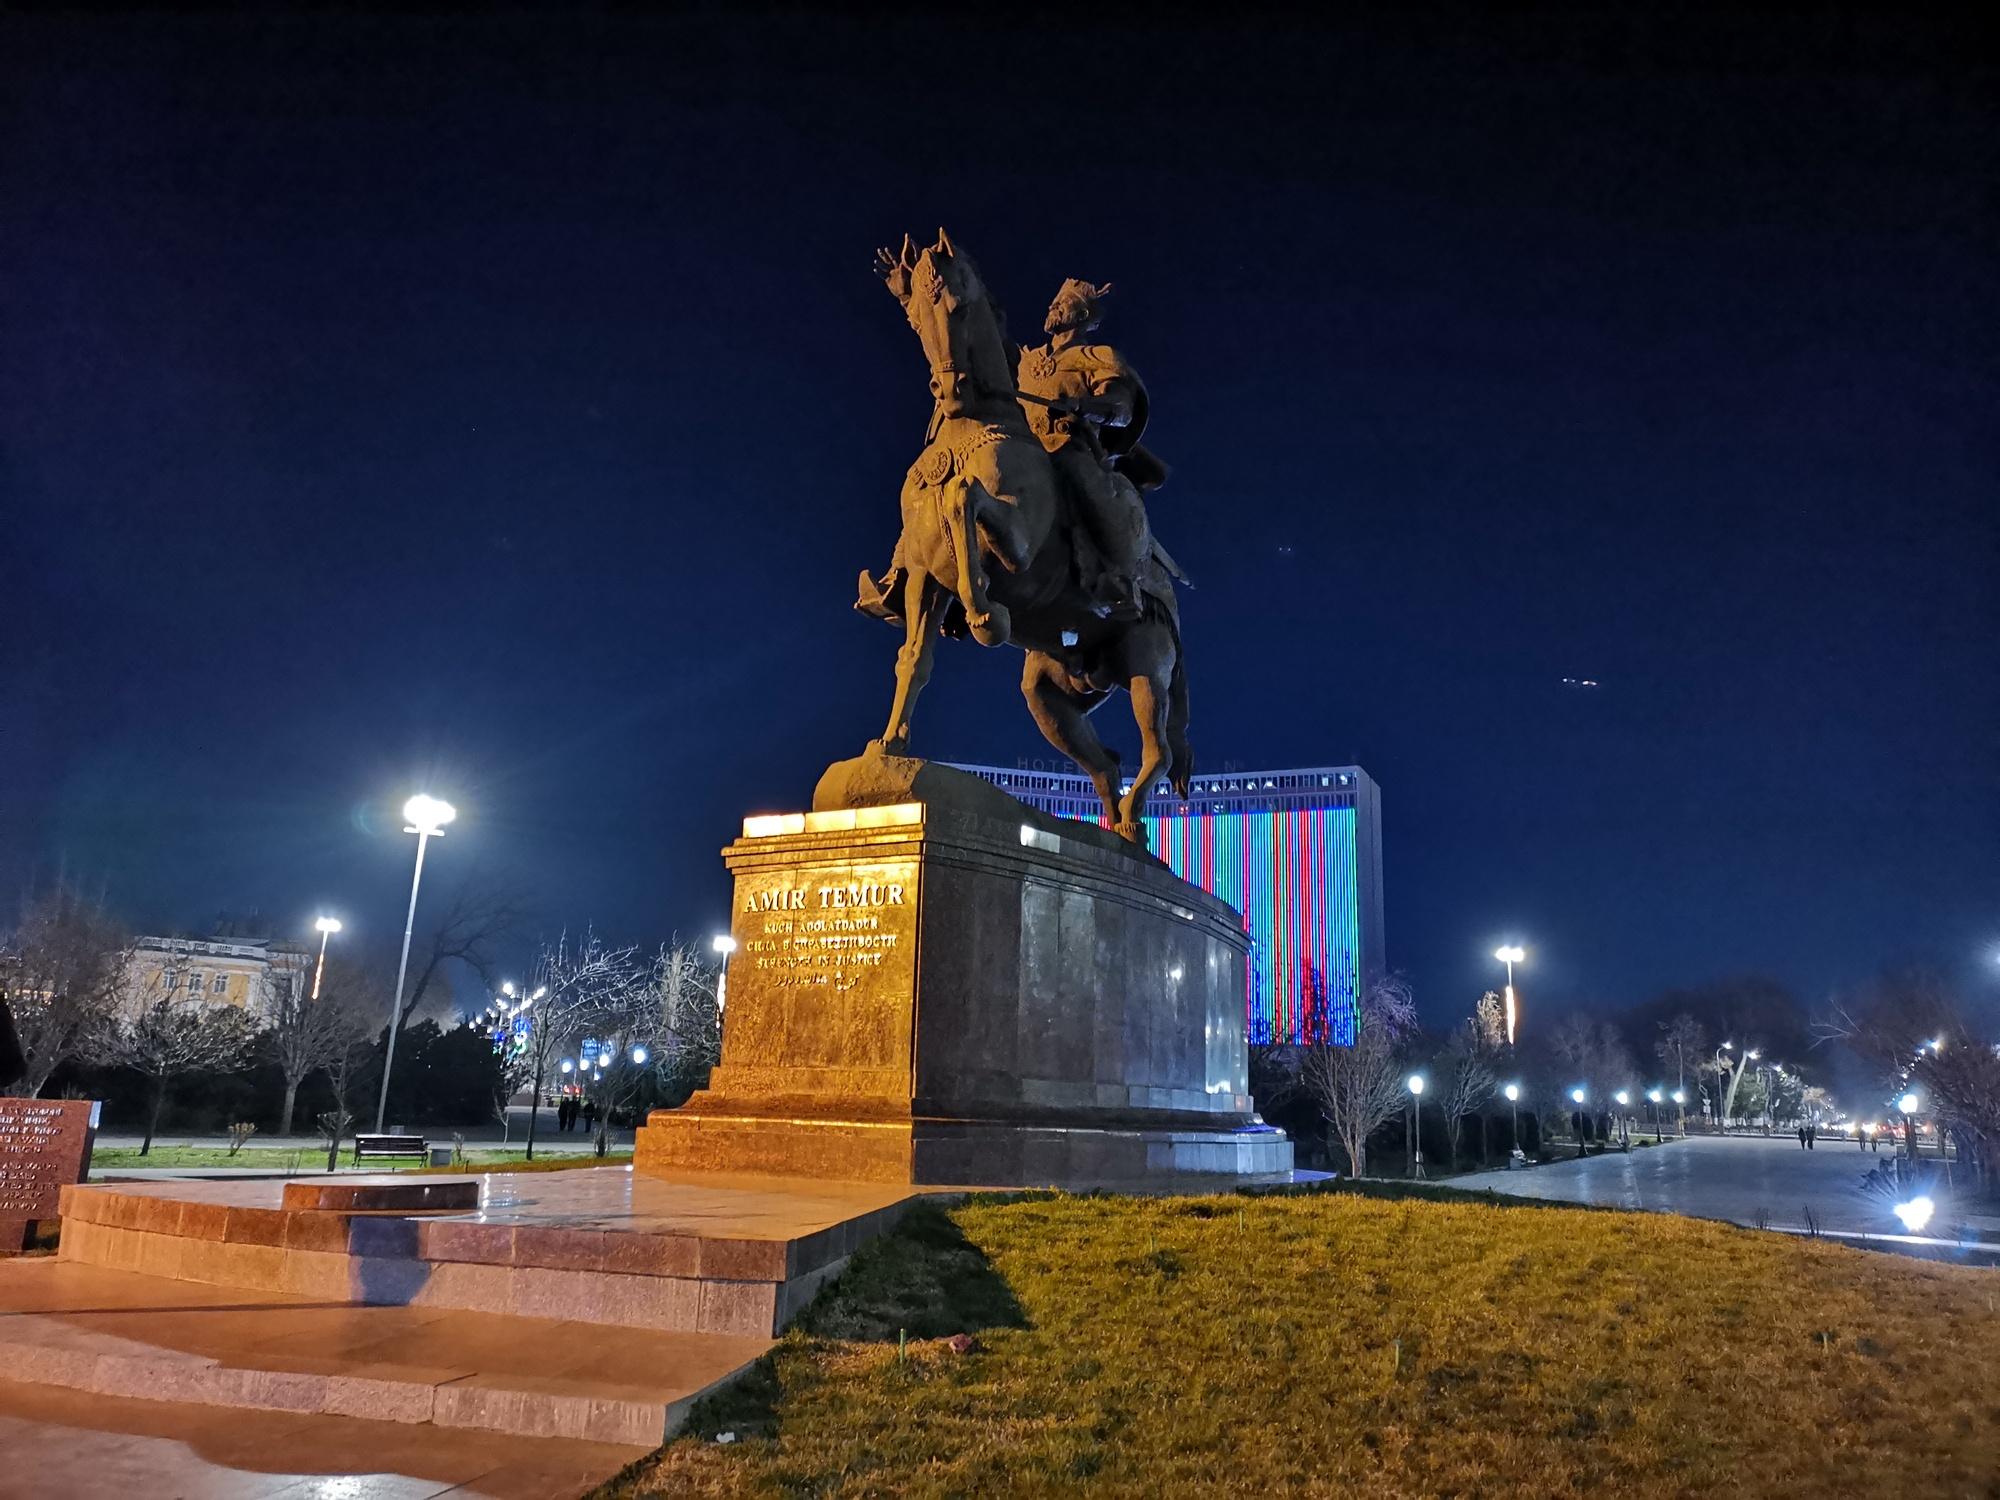 Памятник Эмиру Тимуру (Ташкент), Ташкент, Узбекистан